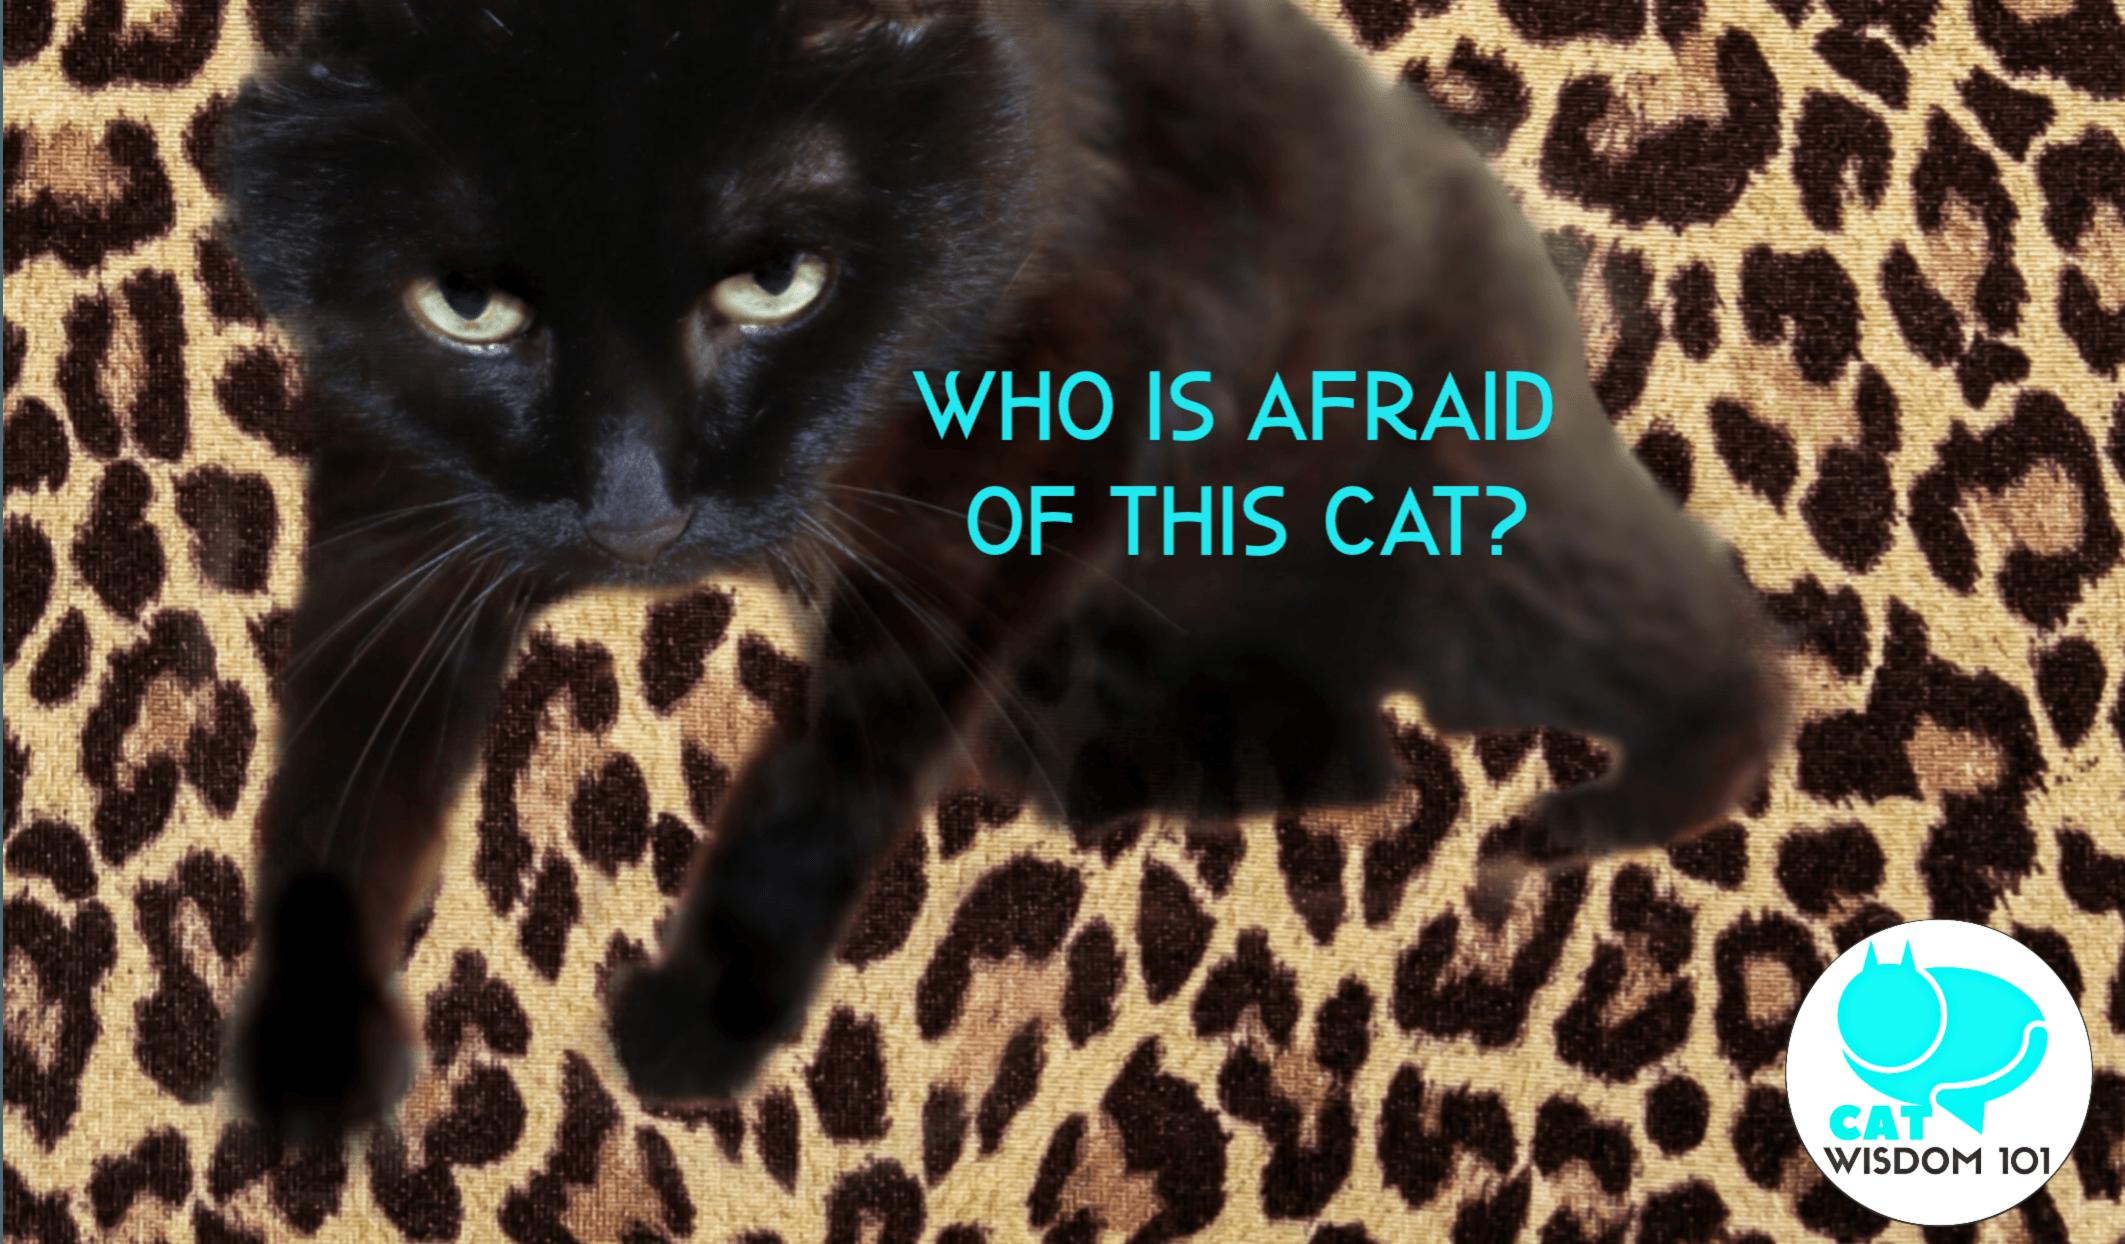 clyde_yoga_black cat_drama_catwisdom101